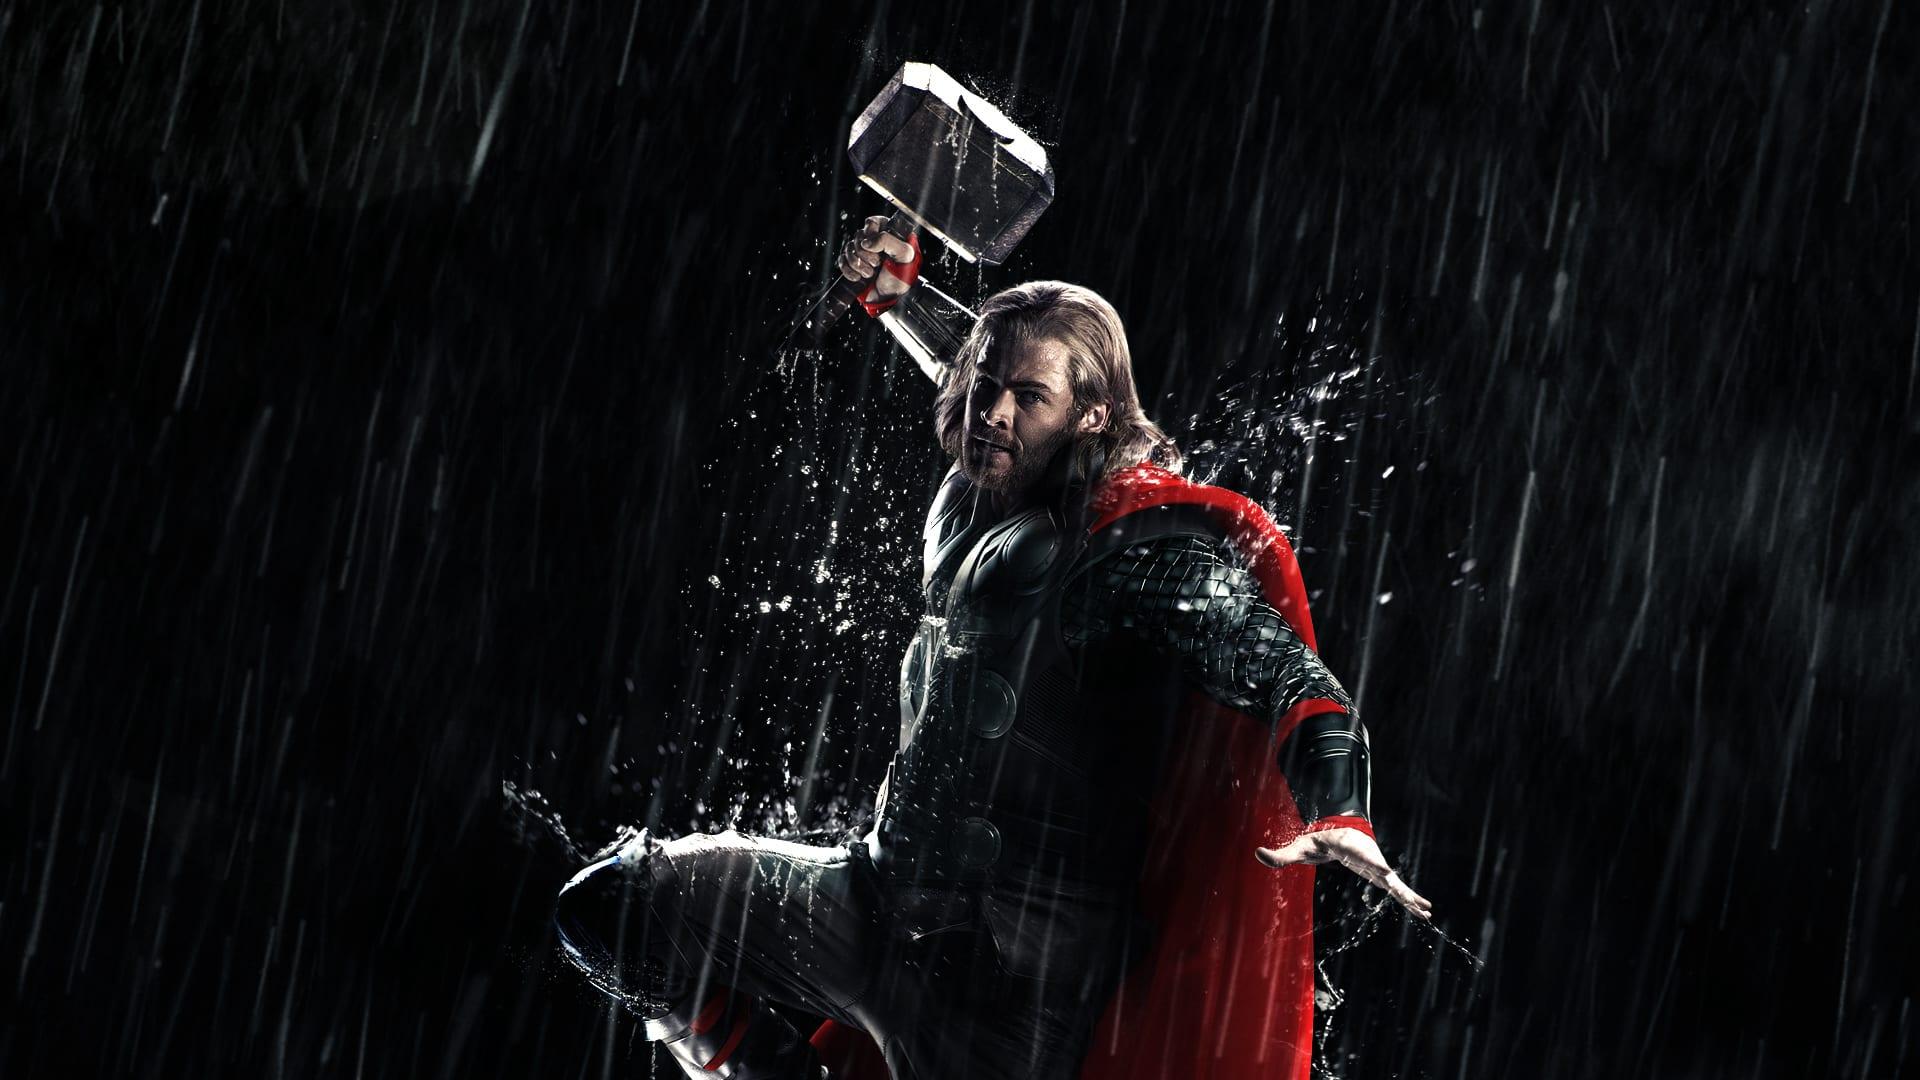 3d Thor Movie Hammer Wallpapers Hd: Thor: The Dark World News